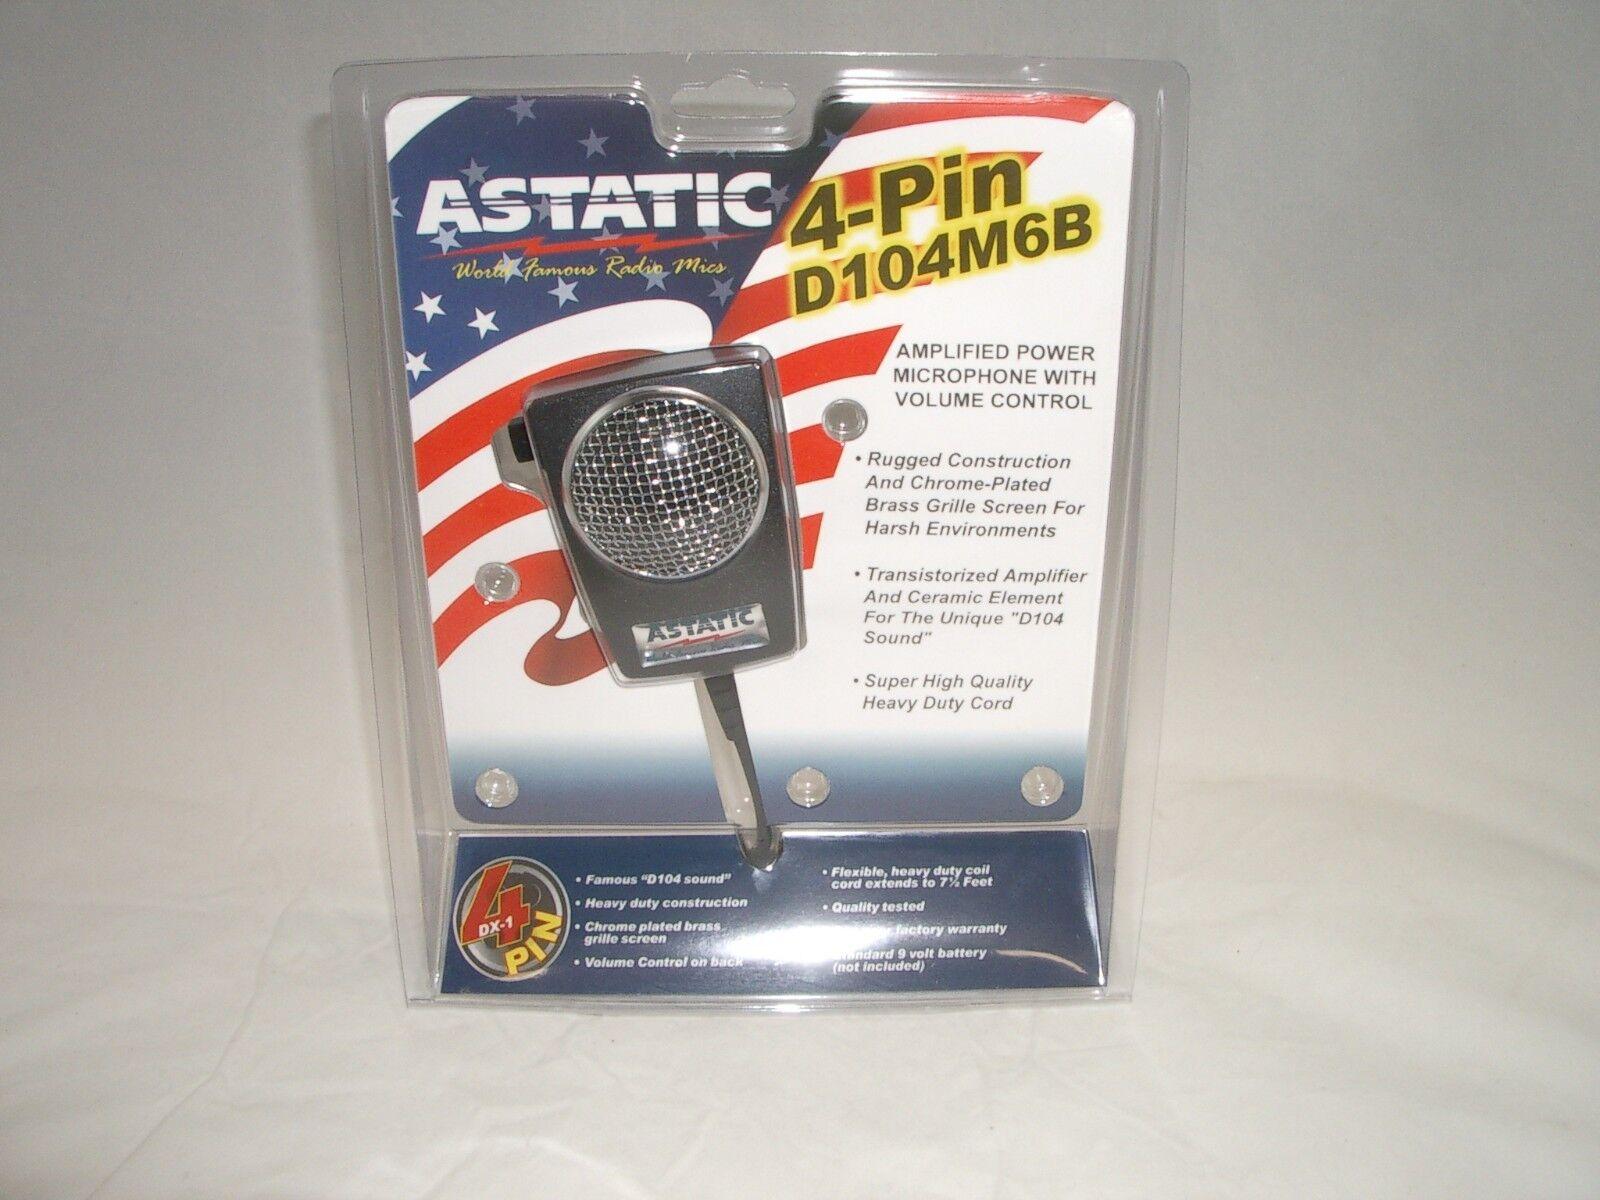 s l1600 astatic d104m6b dx1 radio microphone ebay astatic d104 m6b wiring diagram at cos-gaming.co